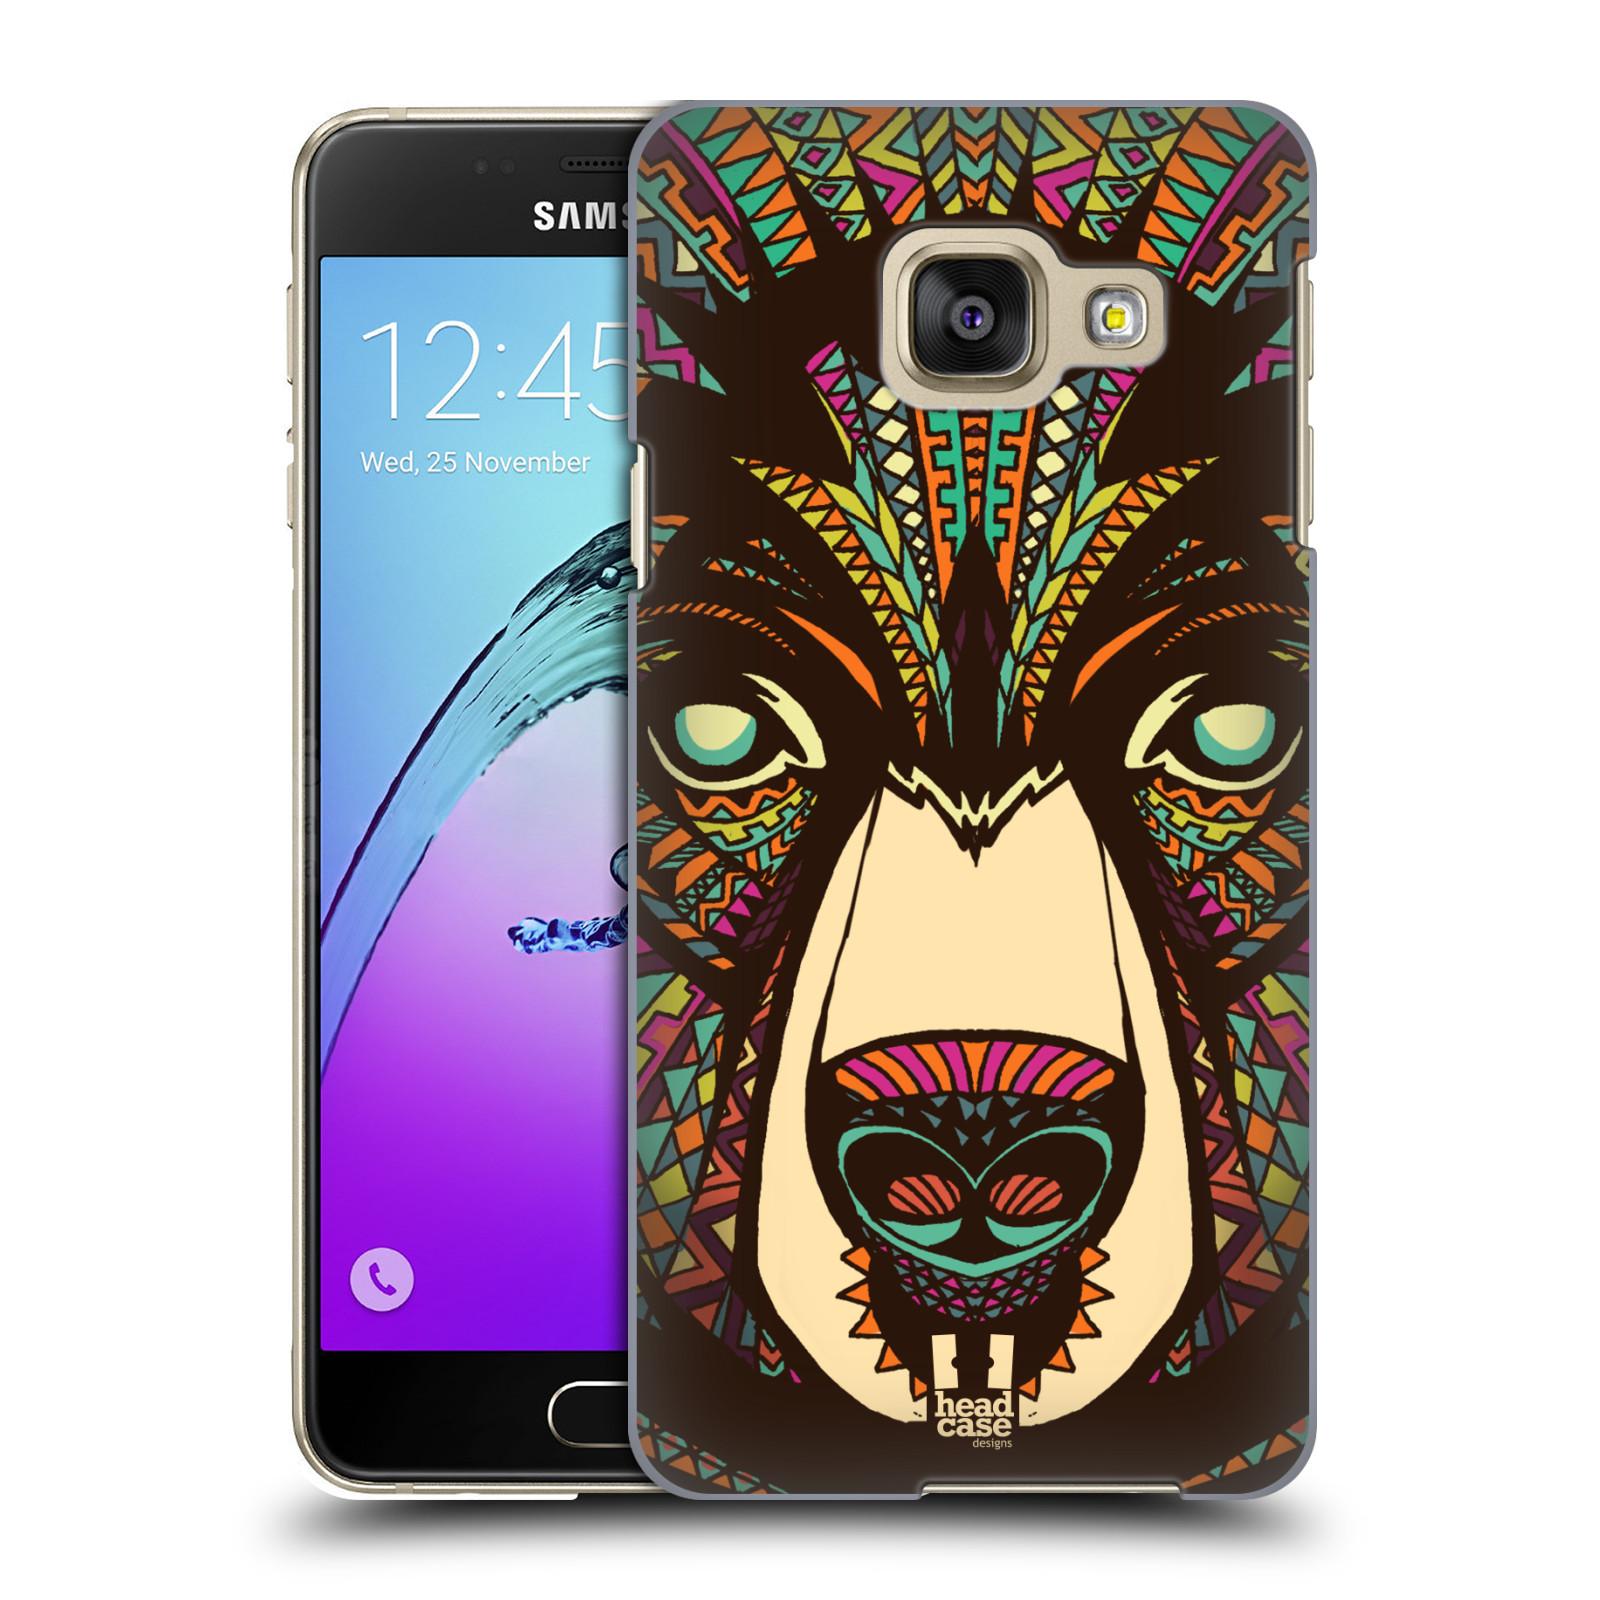 Plastové pouzdro na mobil Samsung Galaxy A3 (2016) HEAD CASE AZTEC MEDVĚD